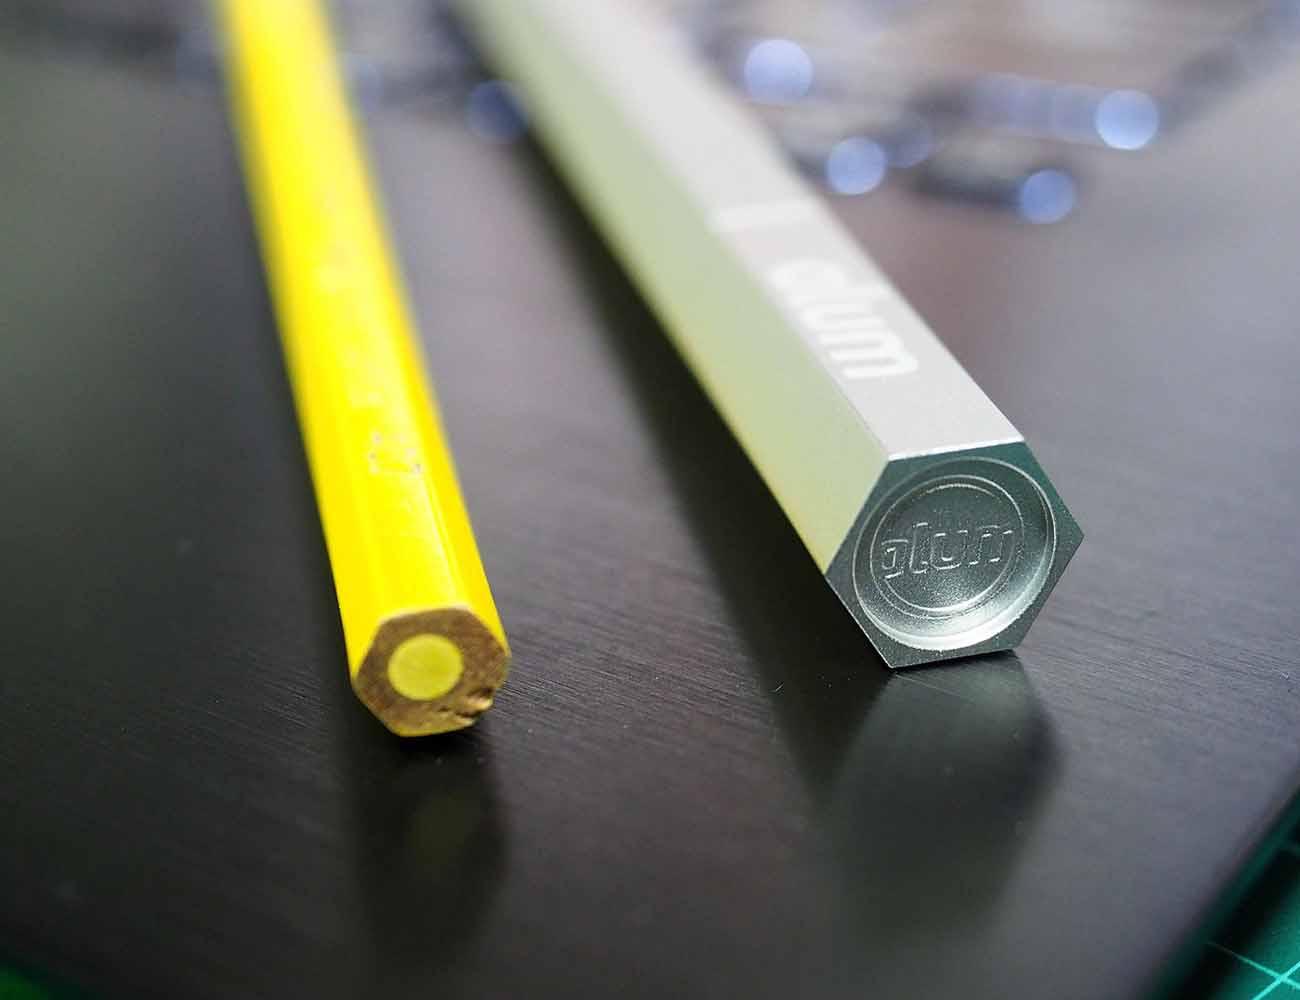 Alum Case – World's First Aluminum Case for the Apple Pencil